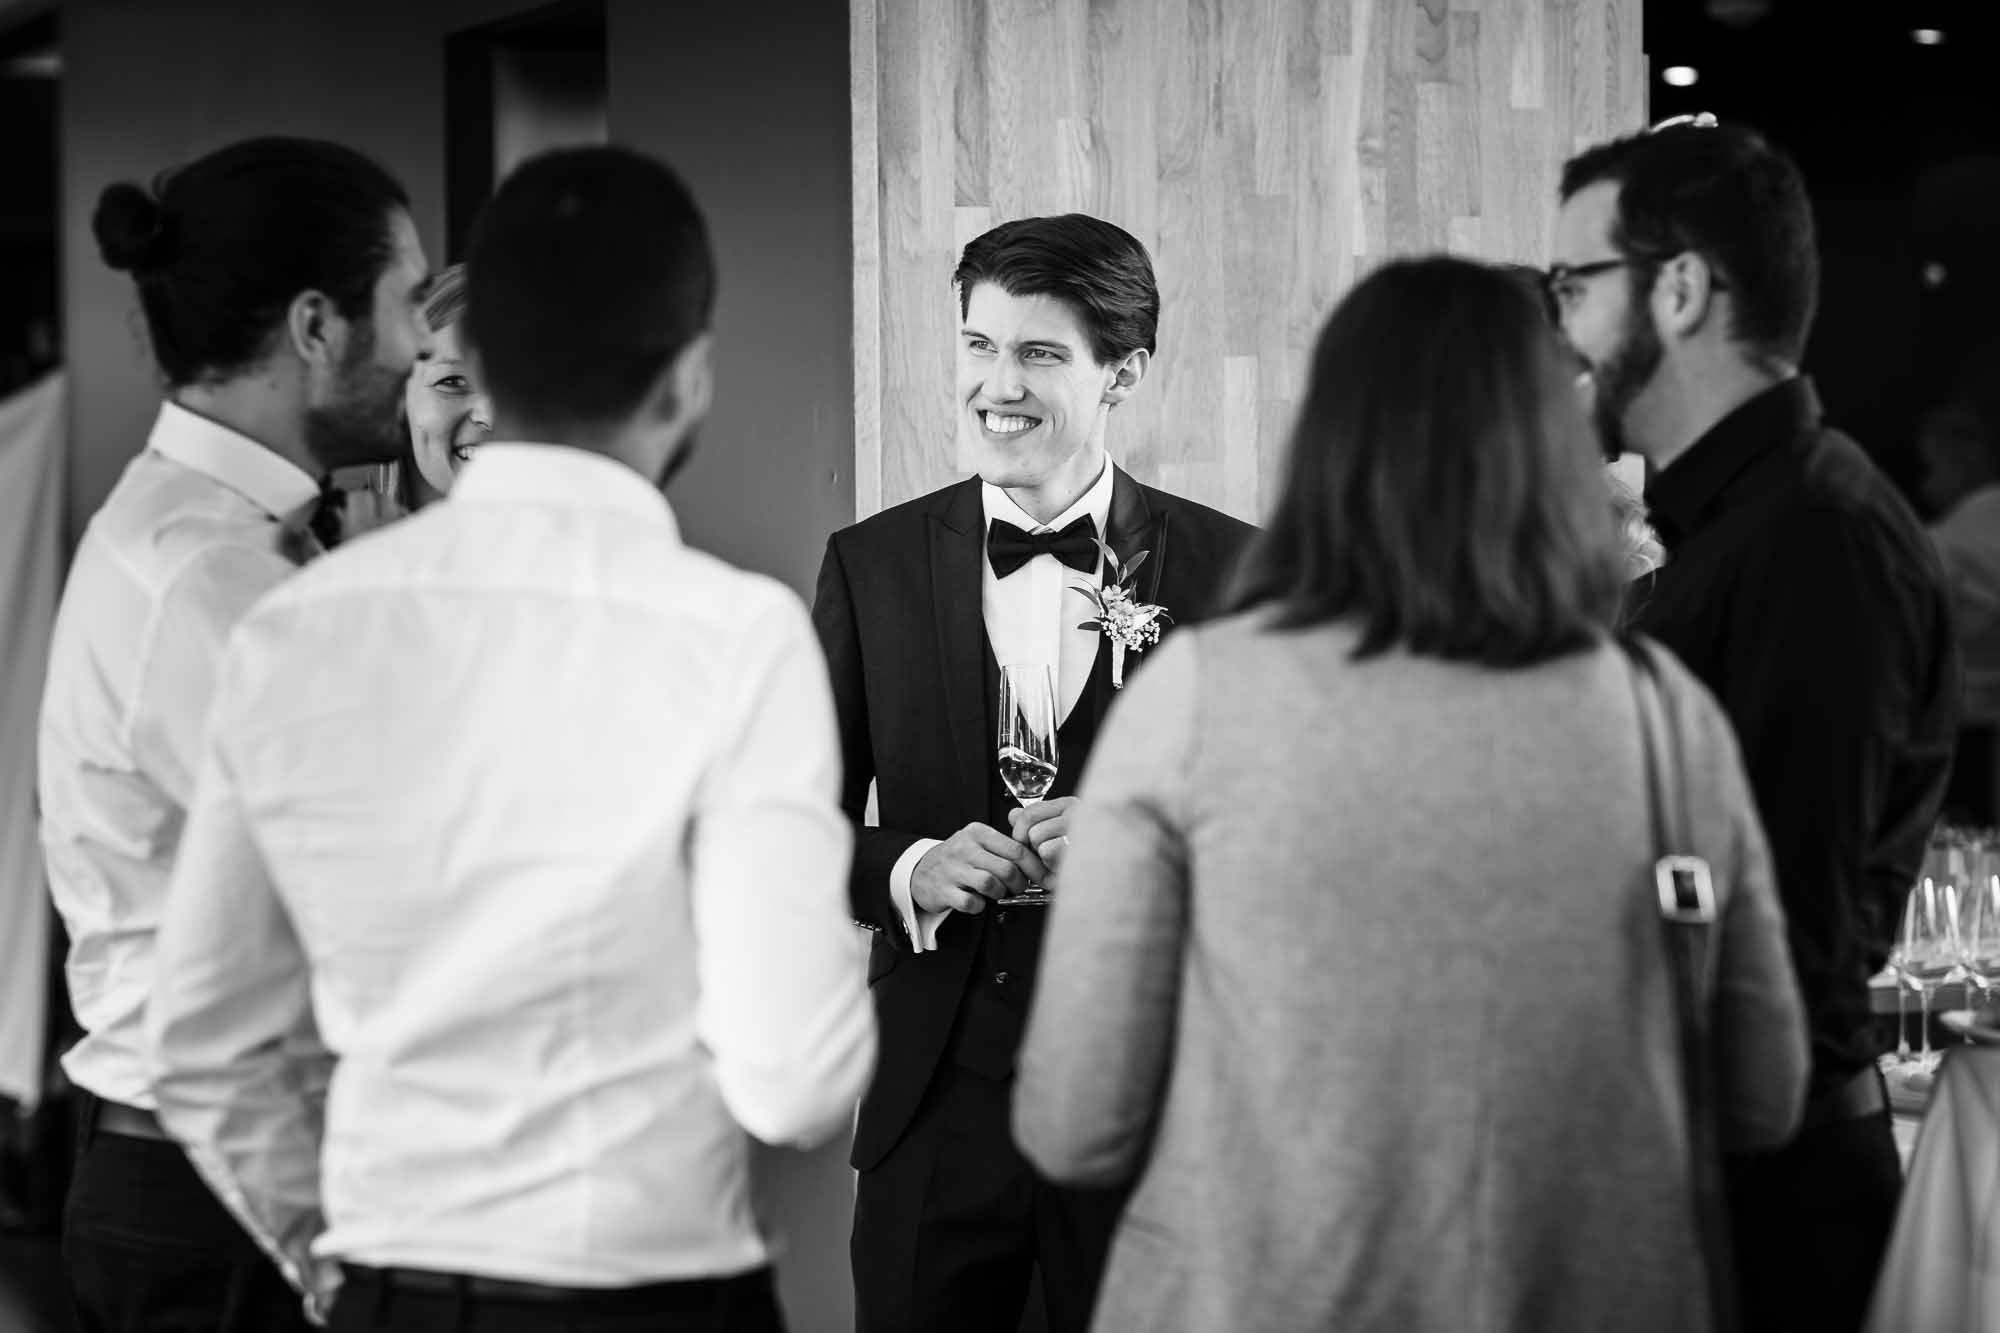 Bräutigam beim Apéro mit Kollegen